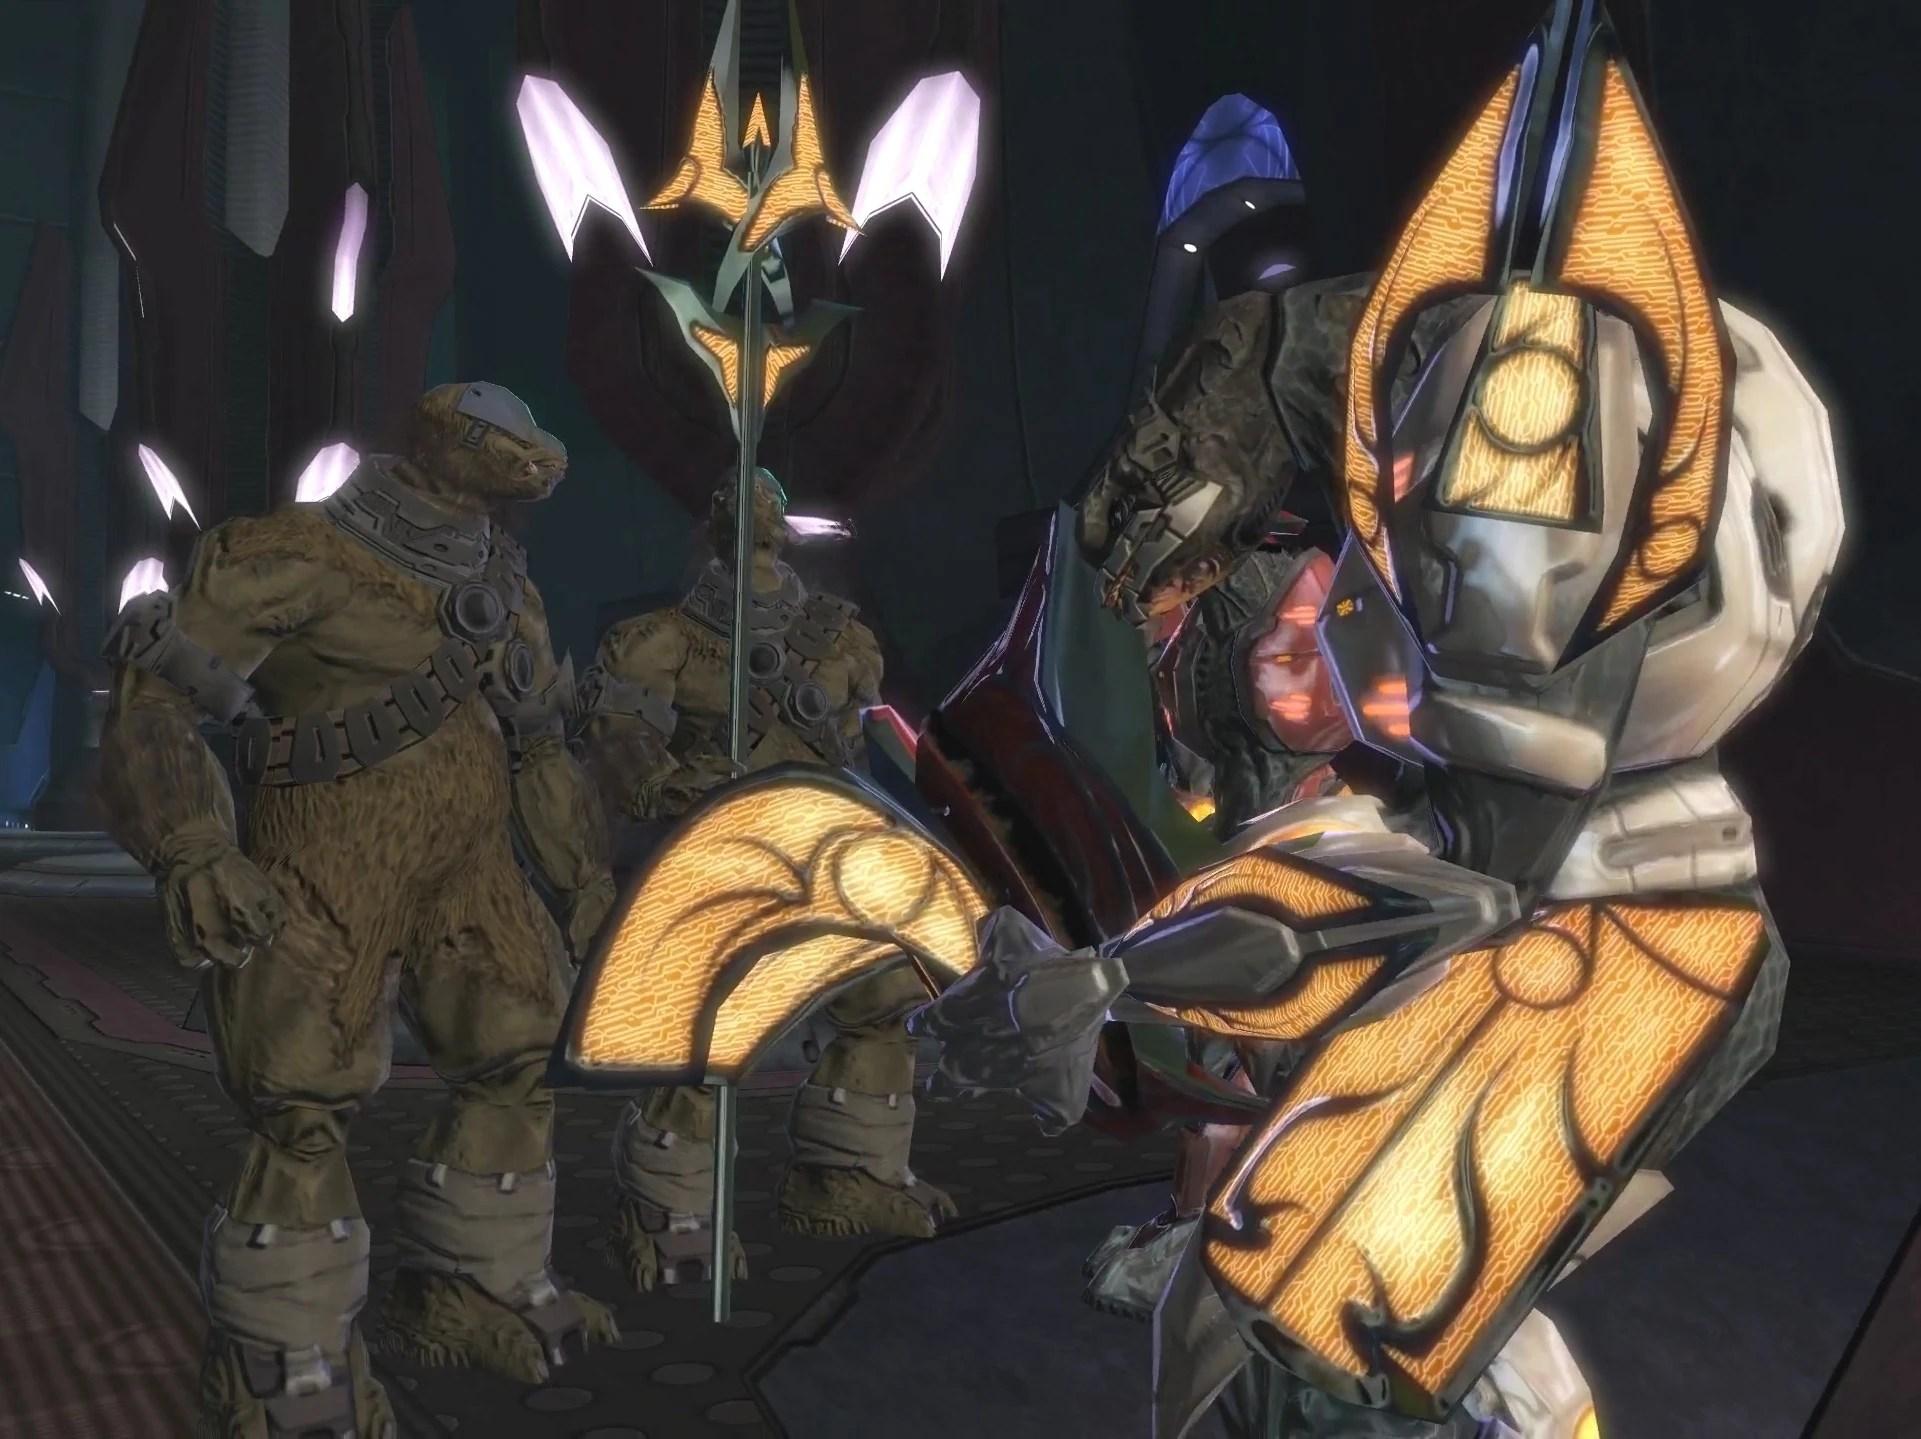 Halo Wallpaper Fall Of Reach Honor Guard Ultra Halo Nation Fandom Powered By Wikia